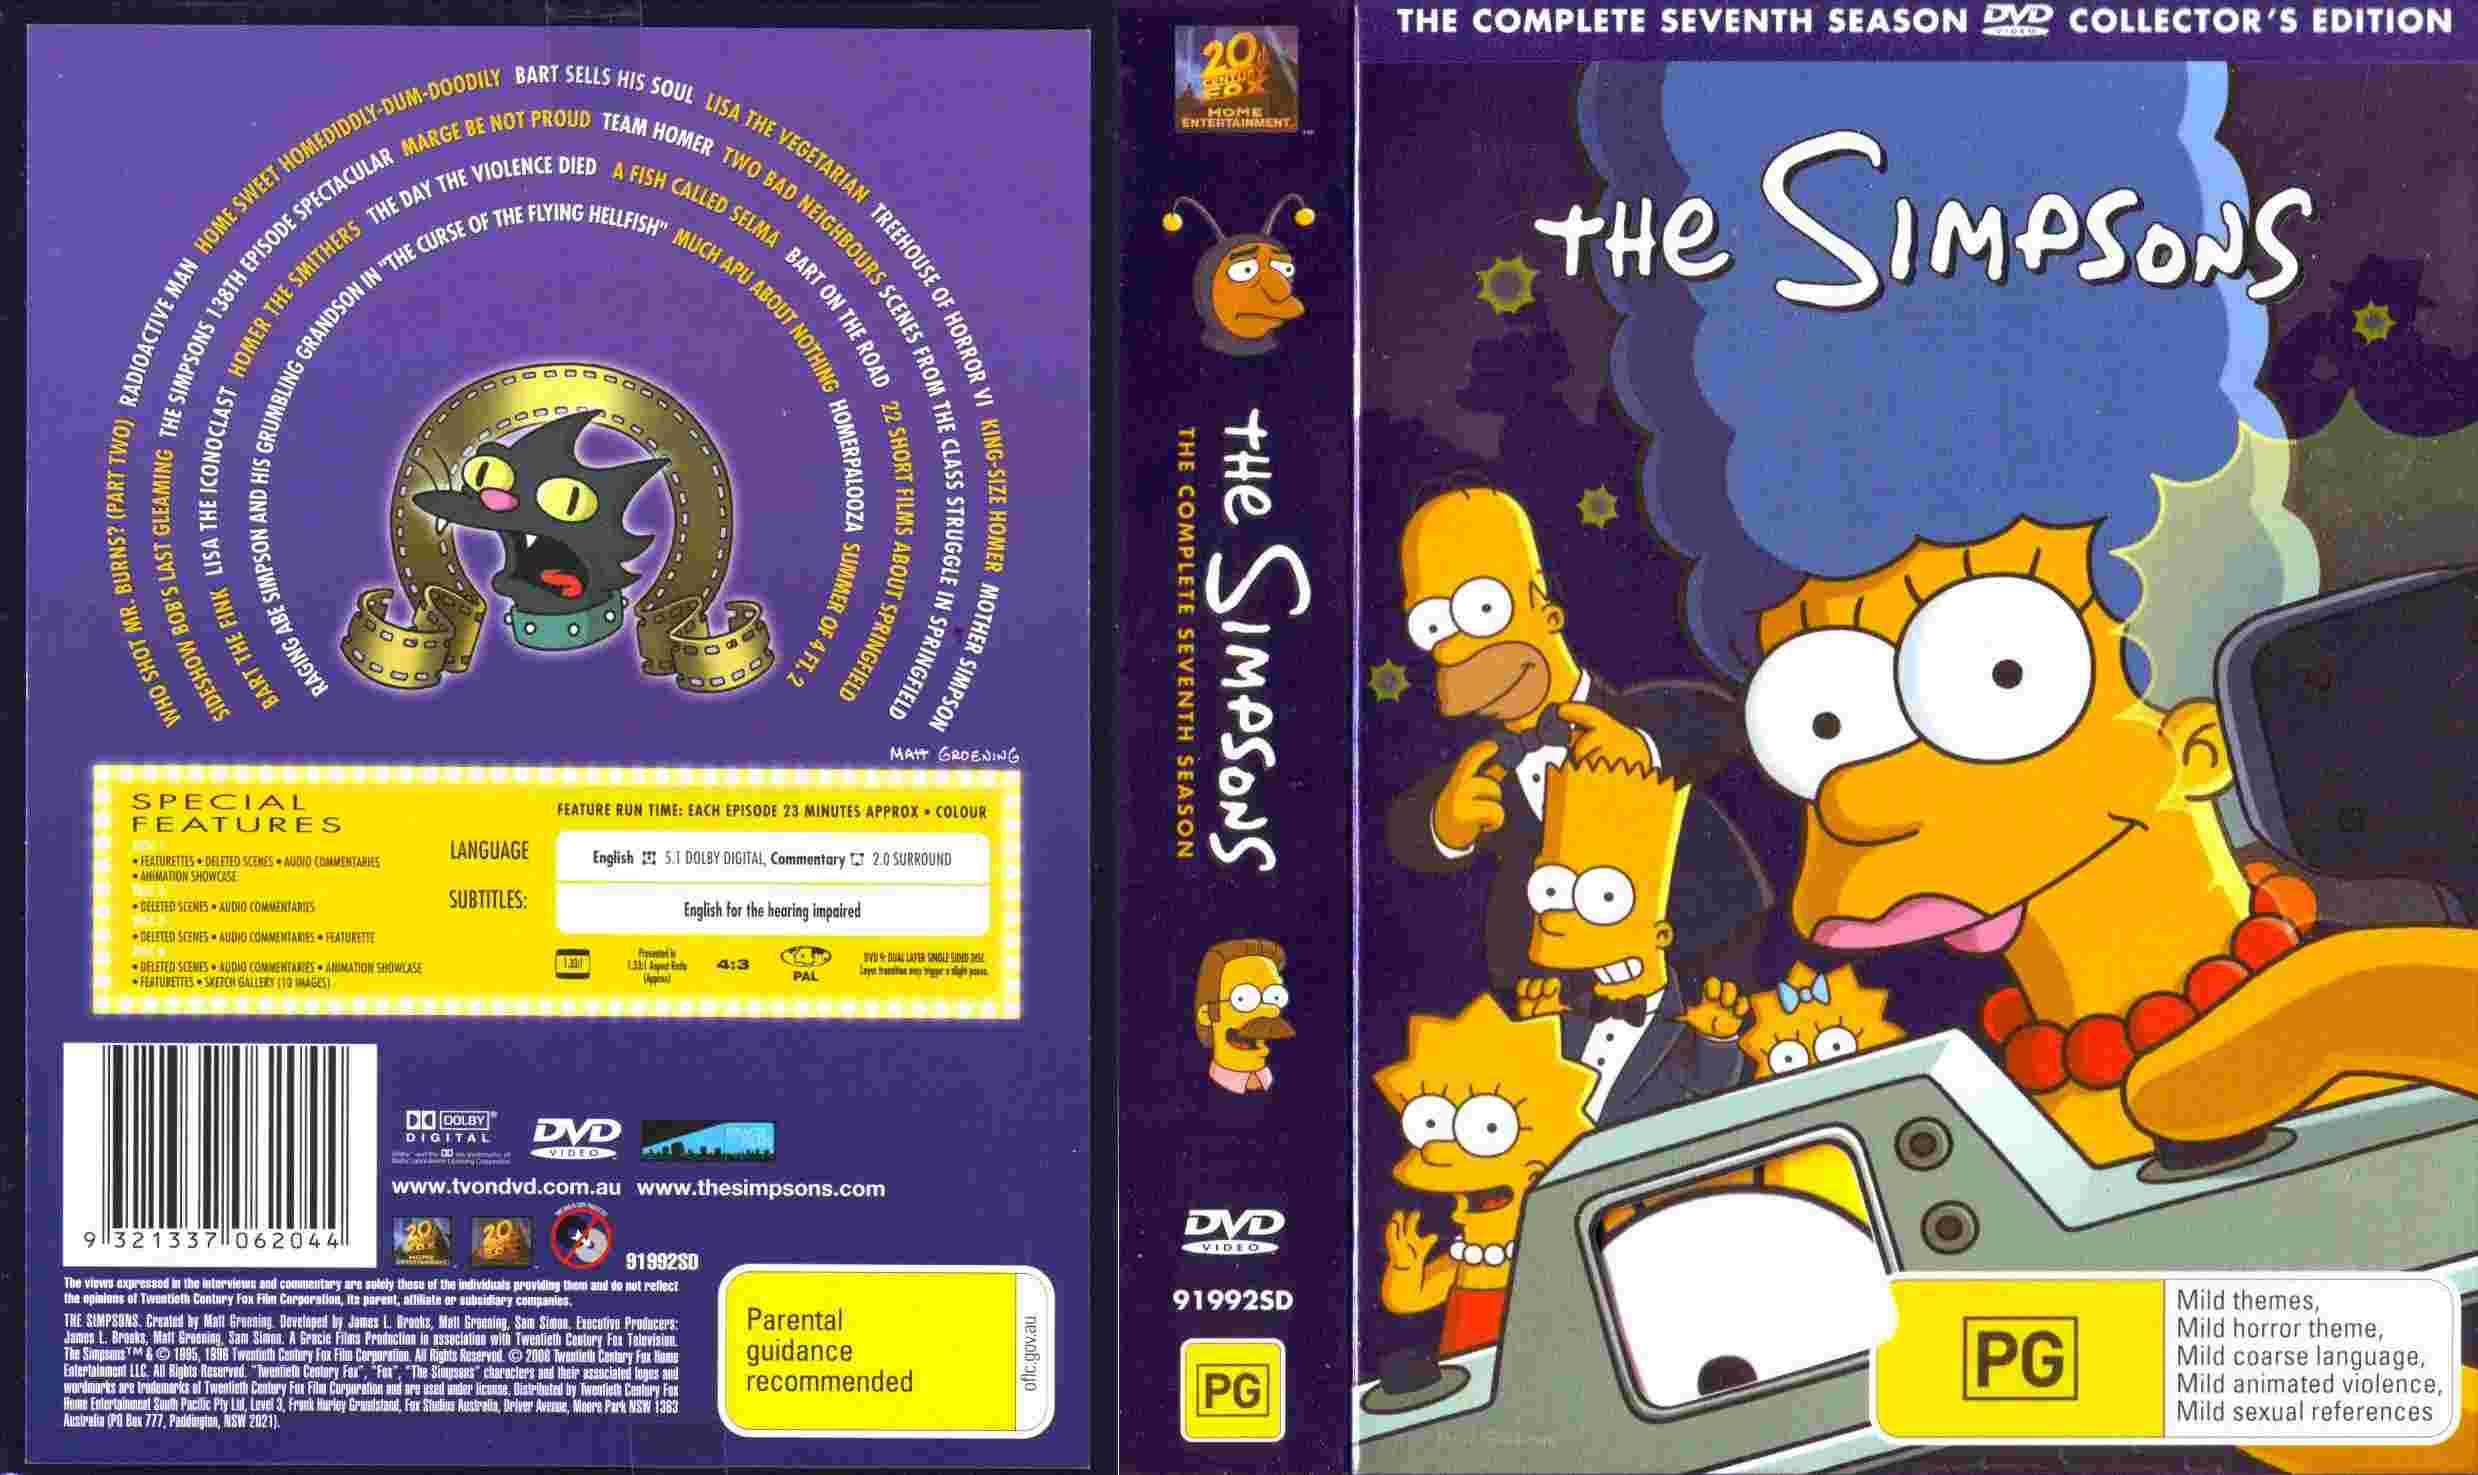 The Simpsons: Season 7